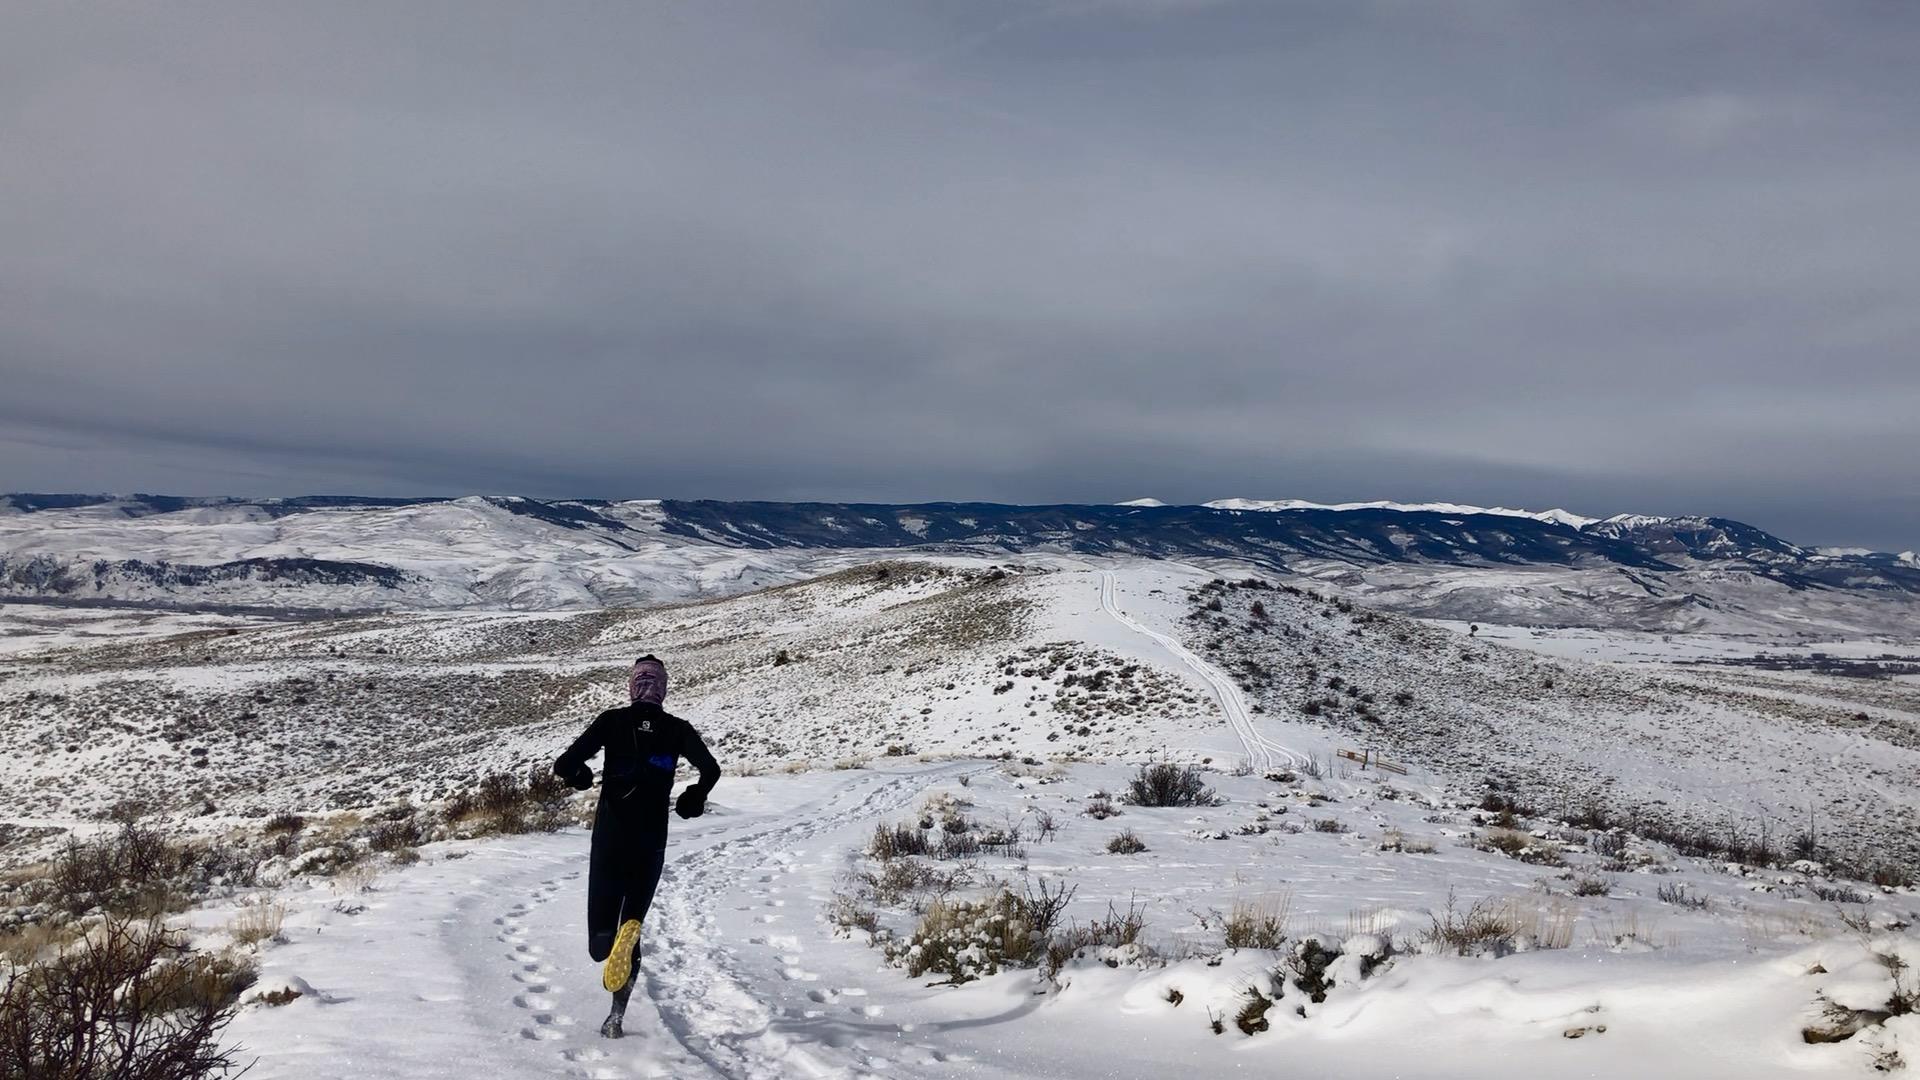 Gordon Gianniny running in the Salomon ADV Skin 5 Set, Gunnison, Colorado